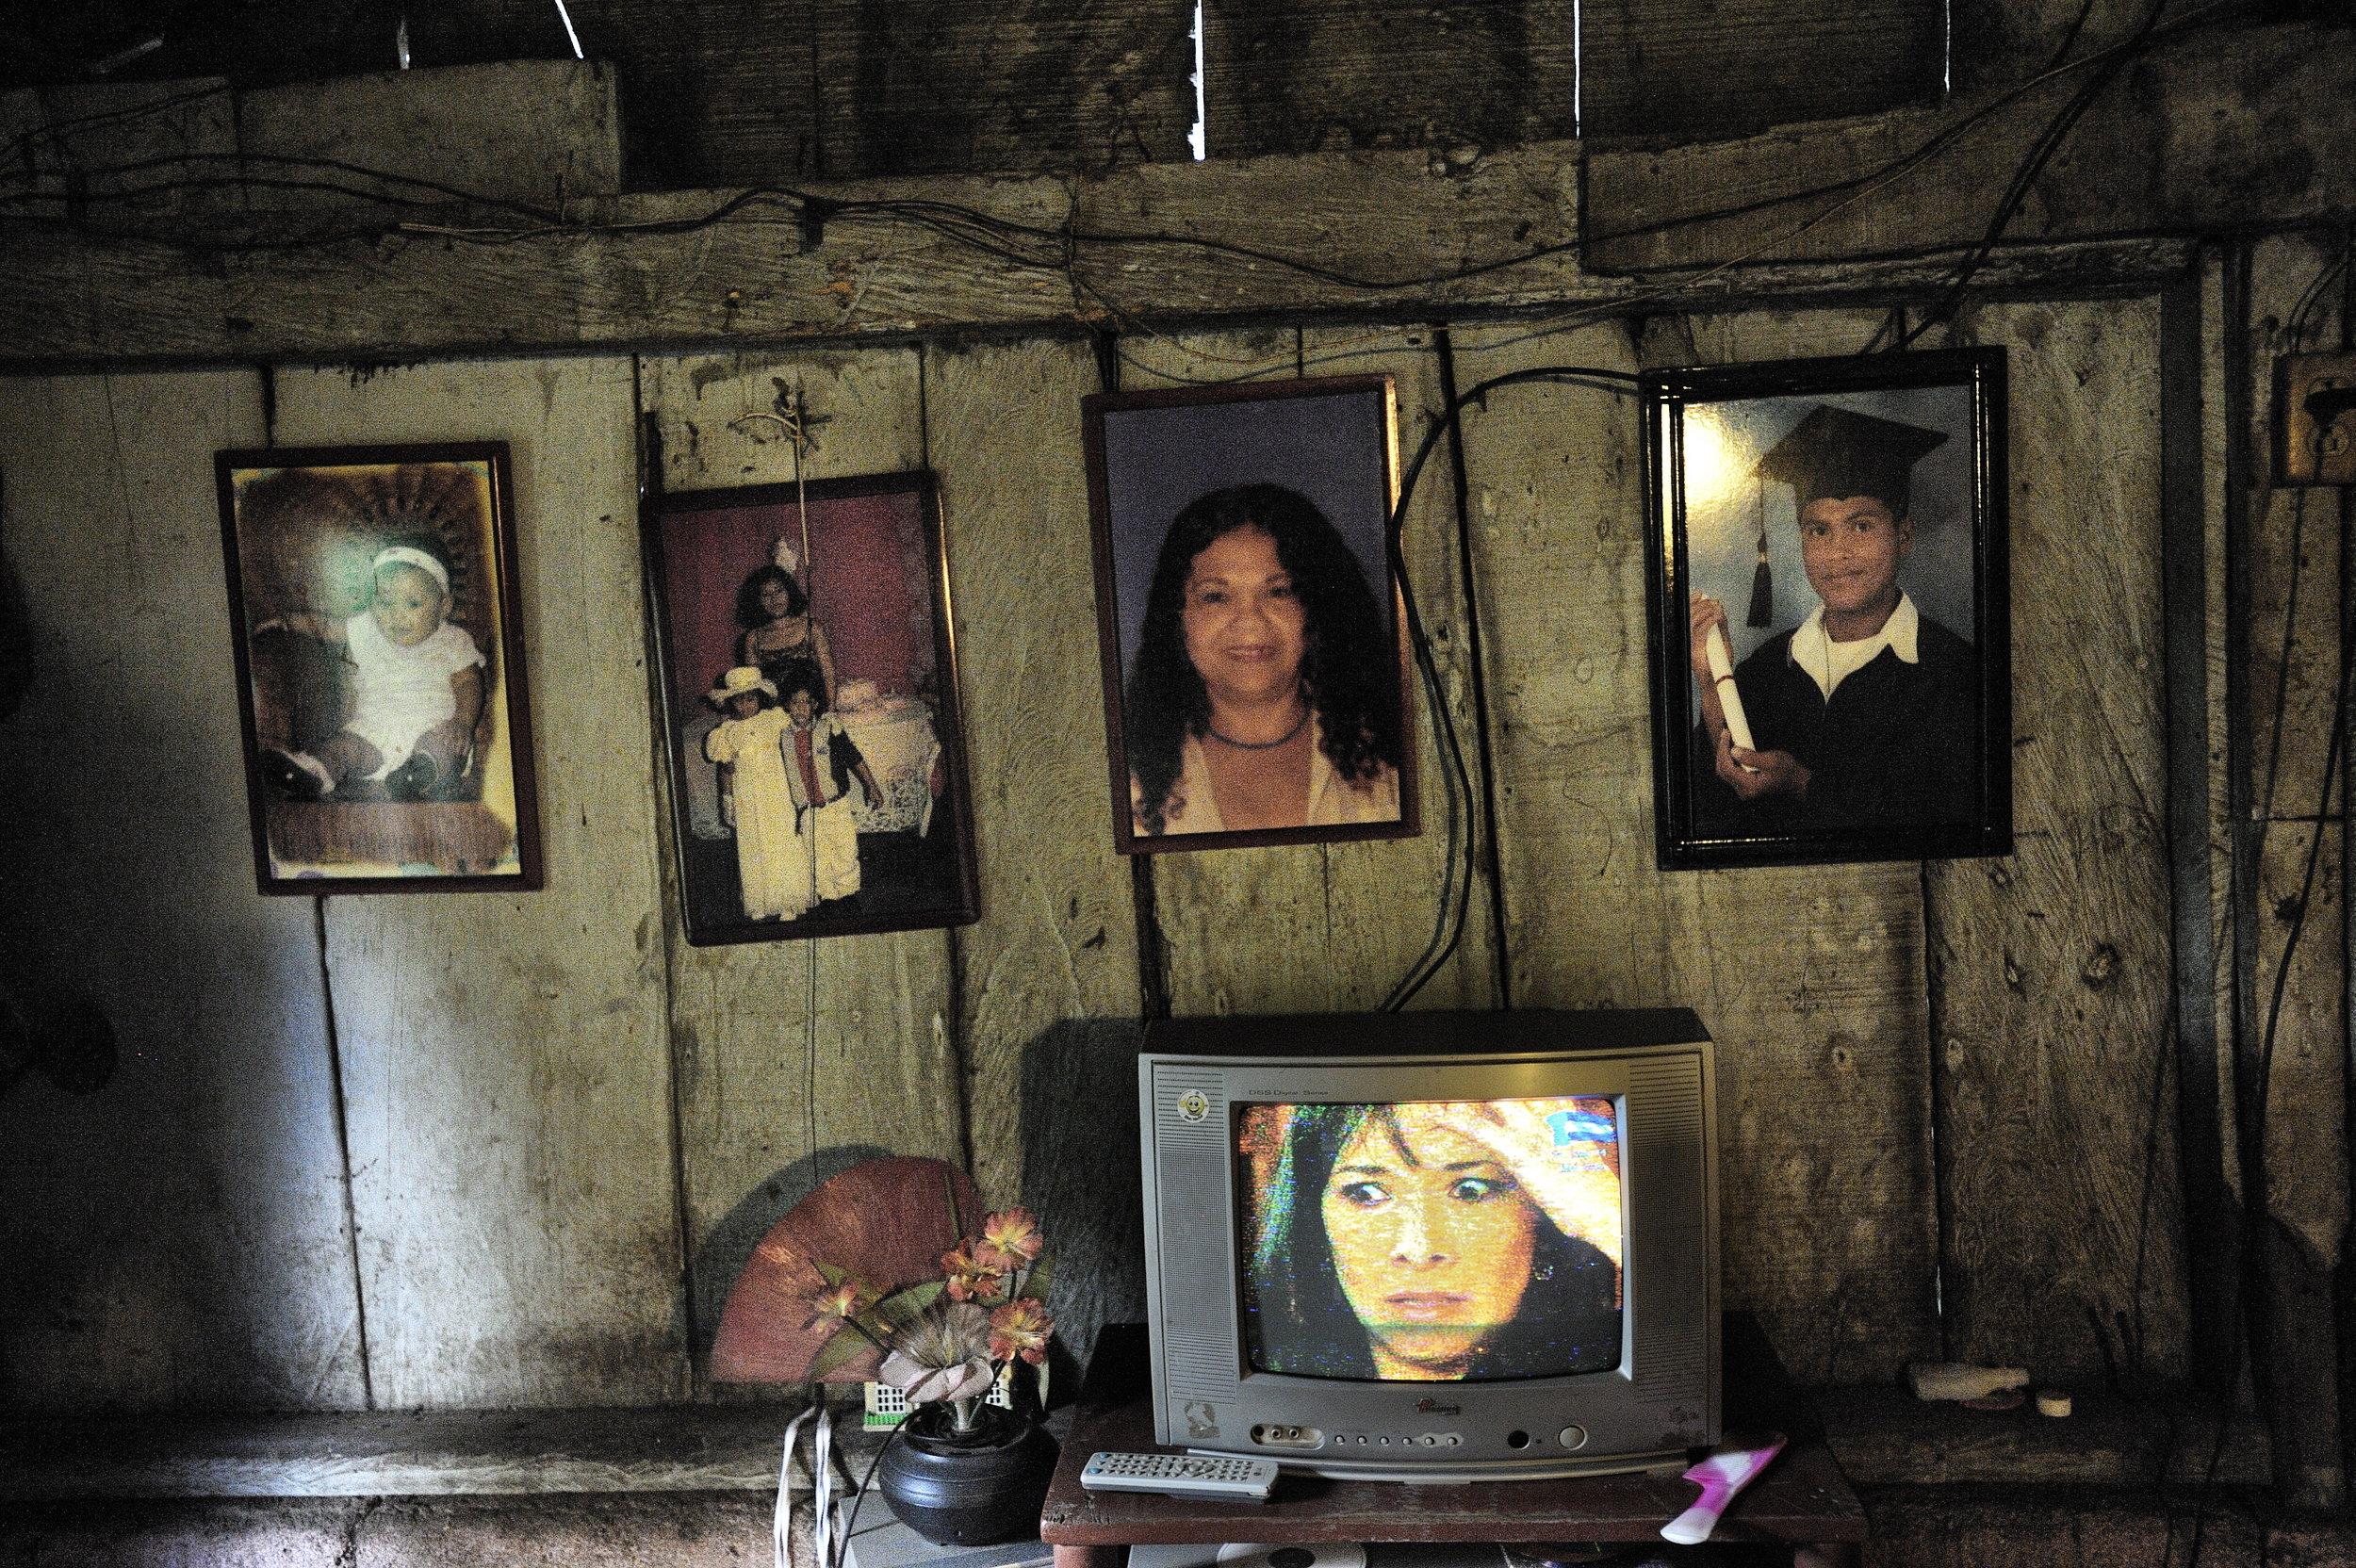 Via Panam, migration in the America's, Nicaragua